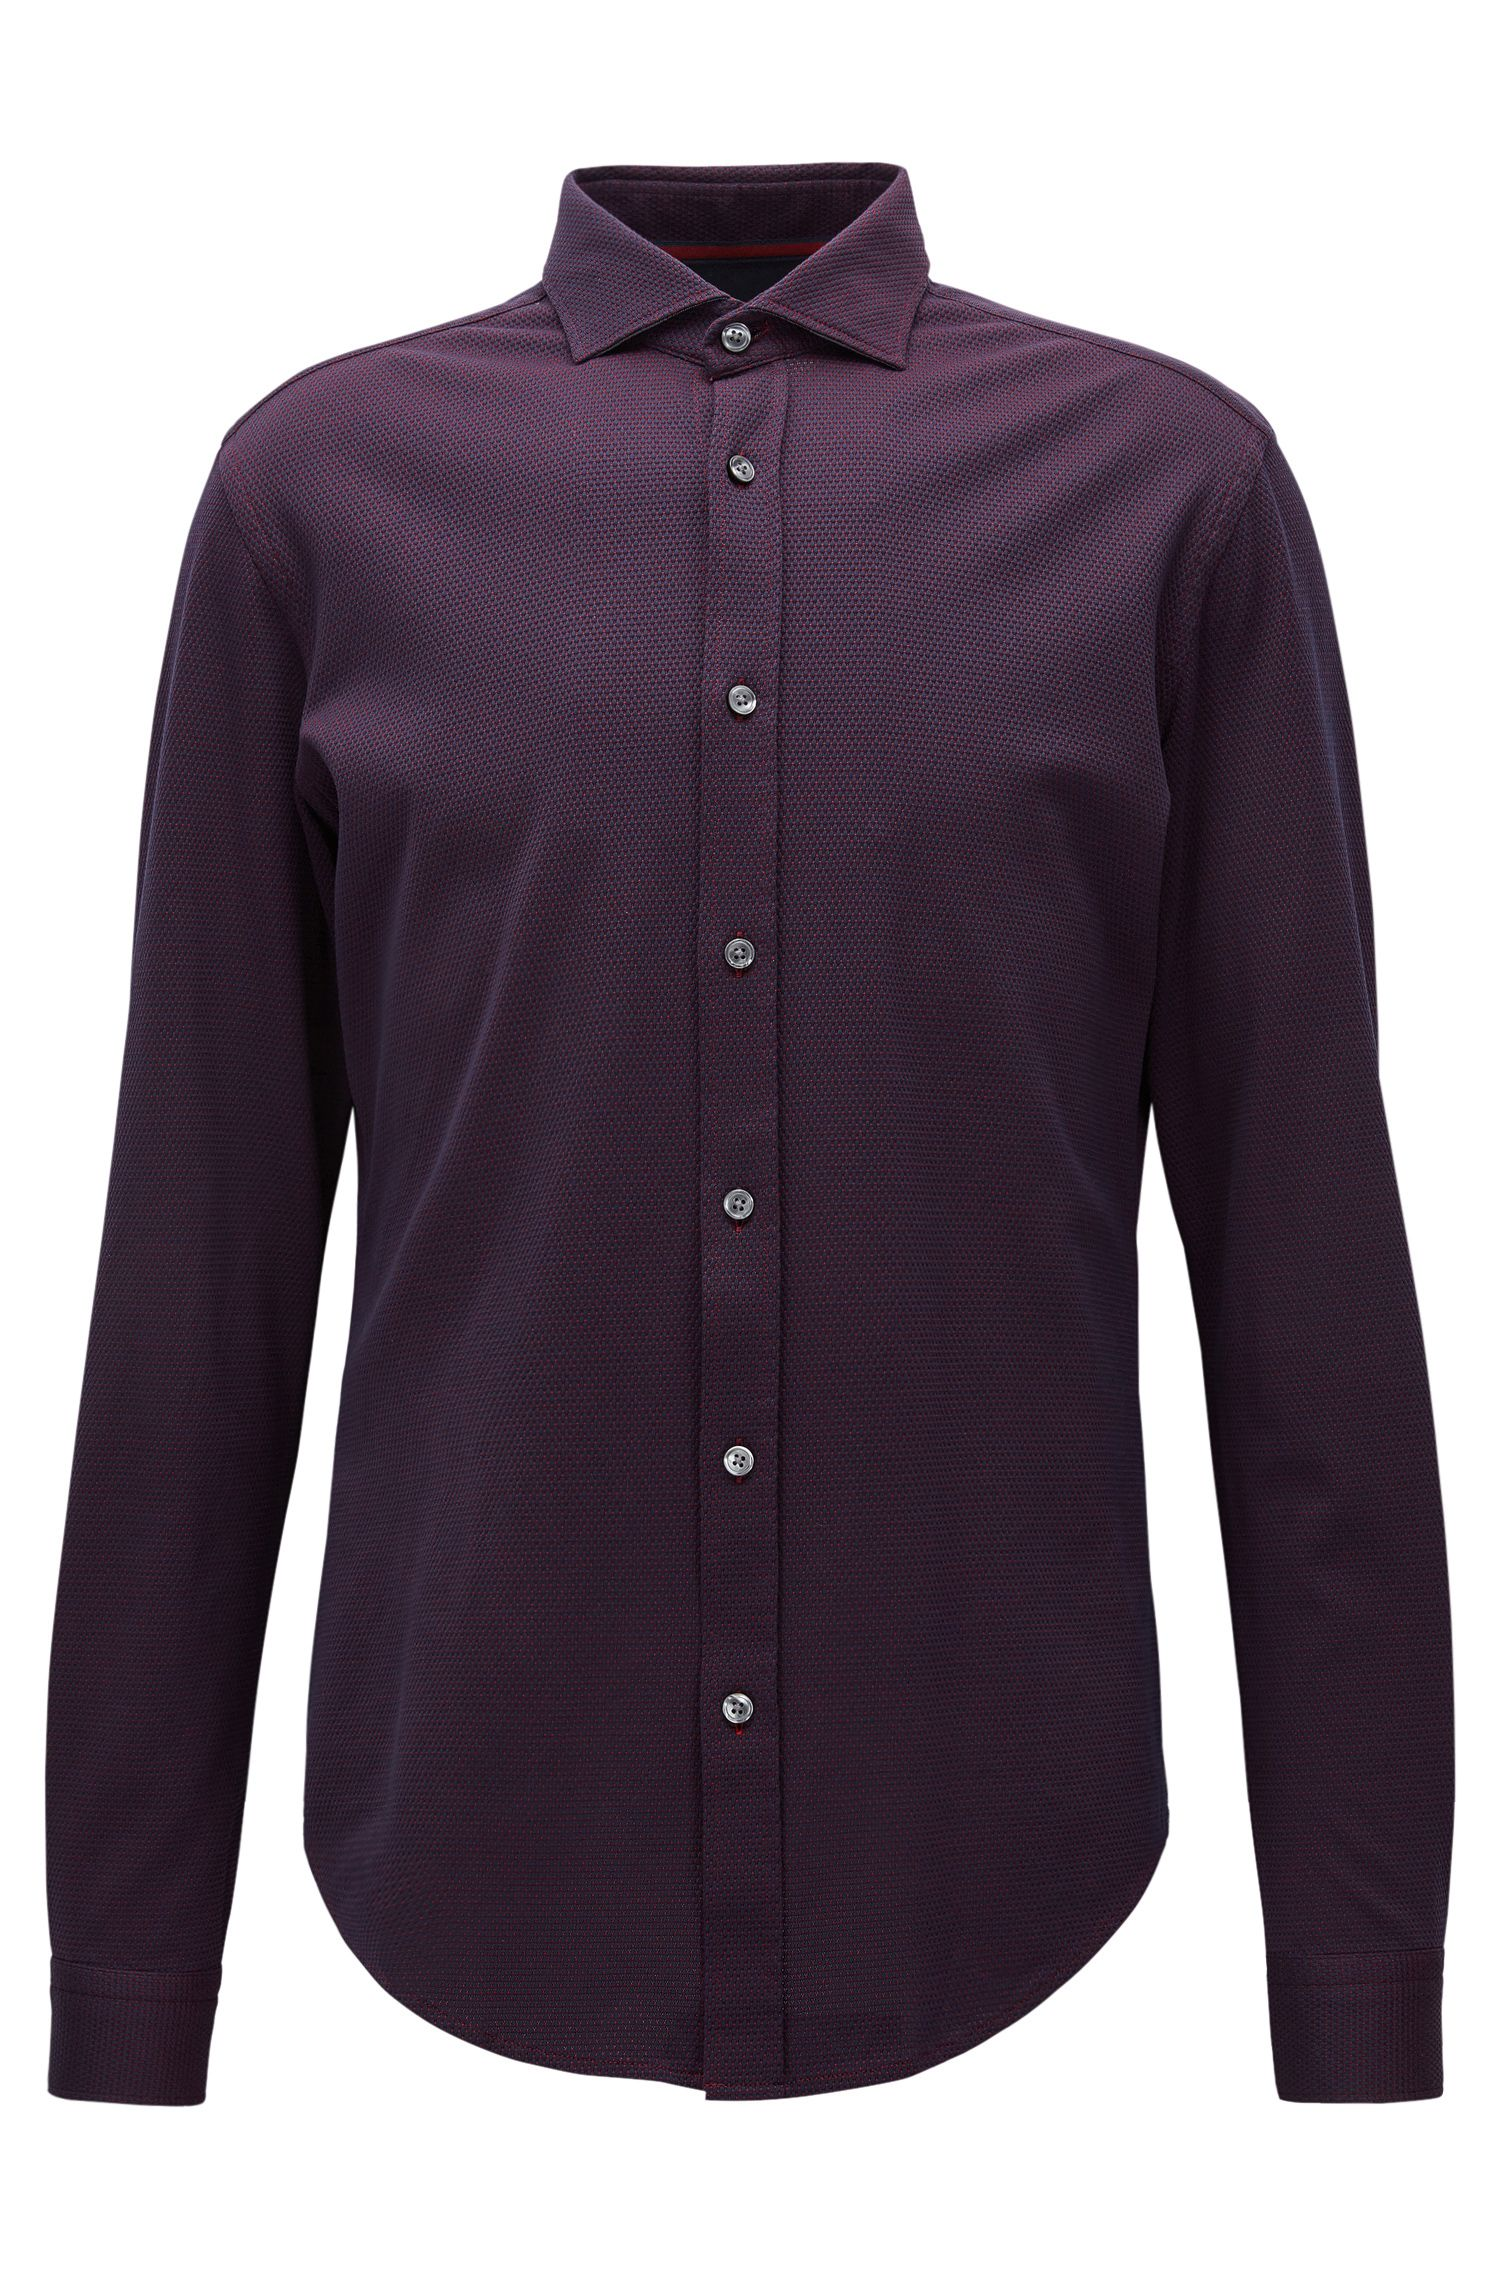 Textured Stretch Cotton Sport Shirt, Slim Fit | Ridley